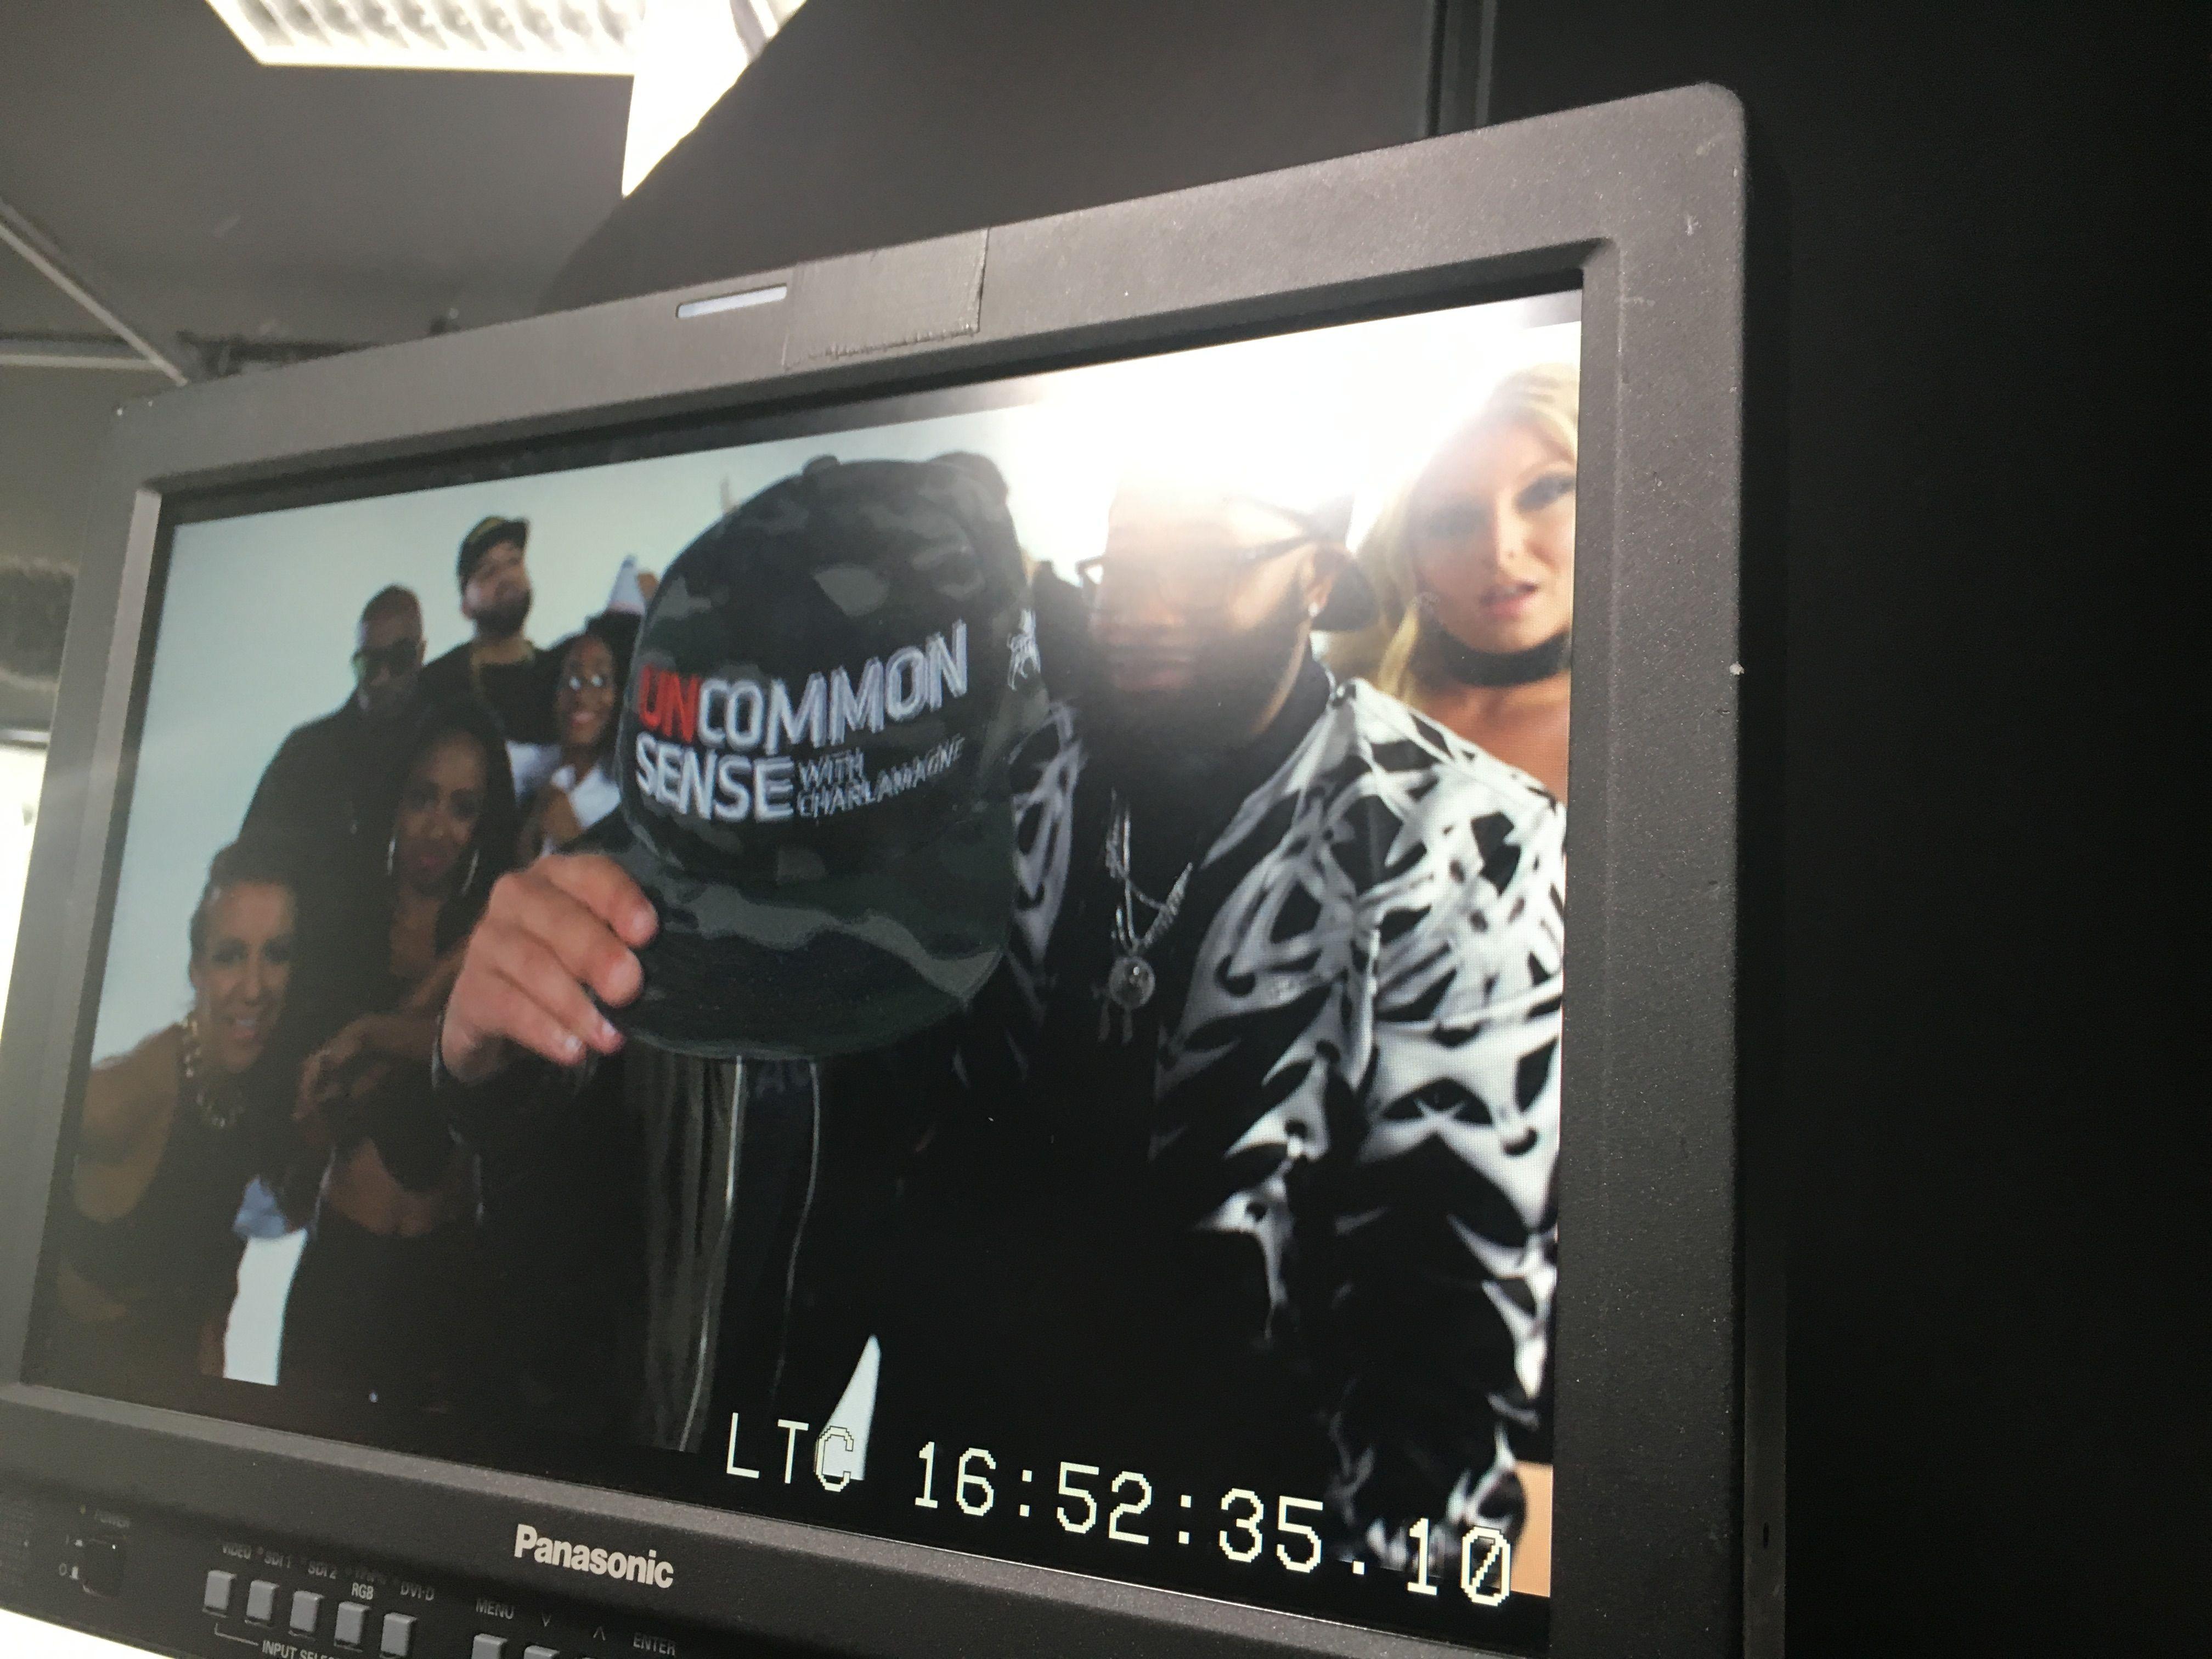 MTV2 Uncommon Sense with Charlamagne